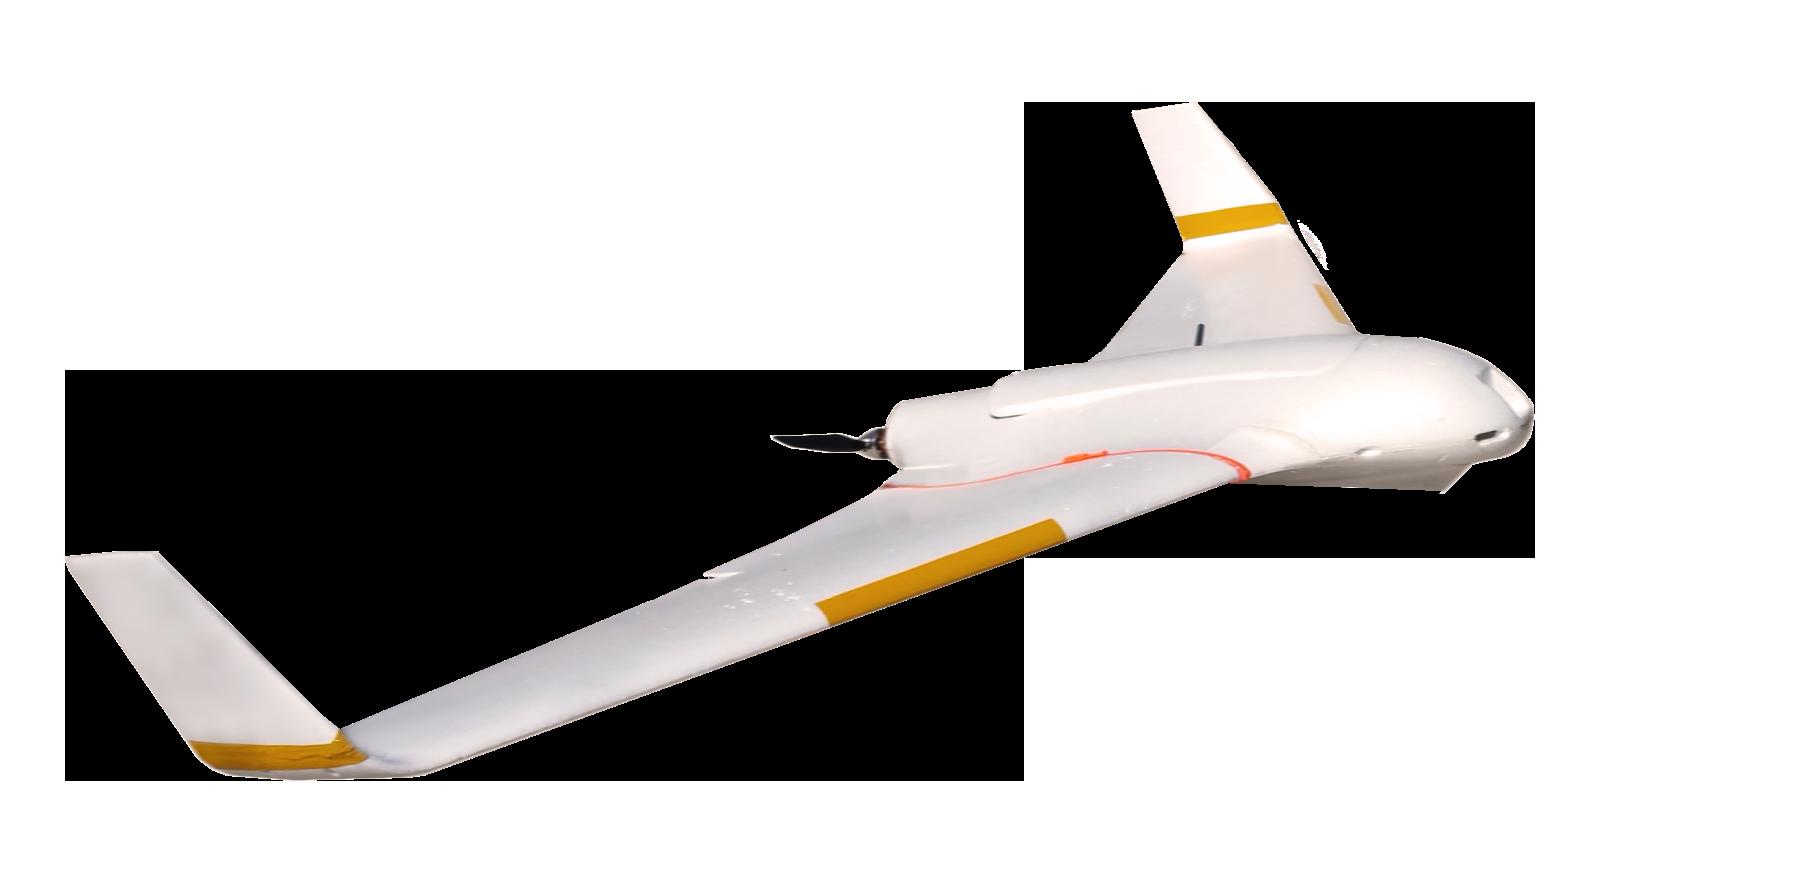 drone-tyc-gis